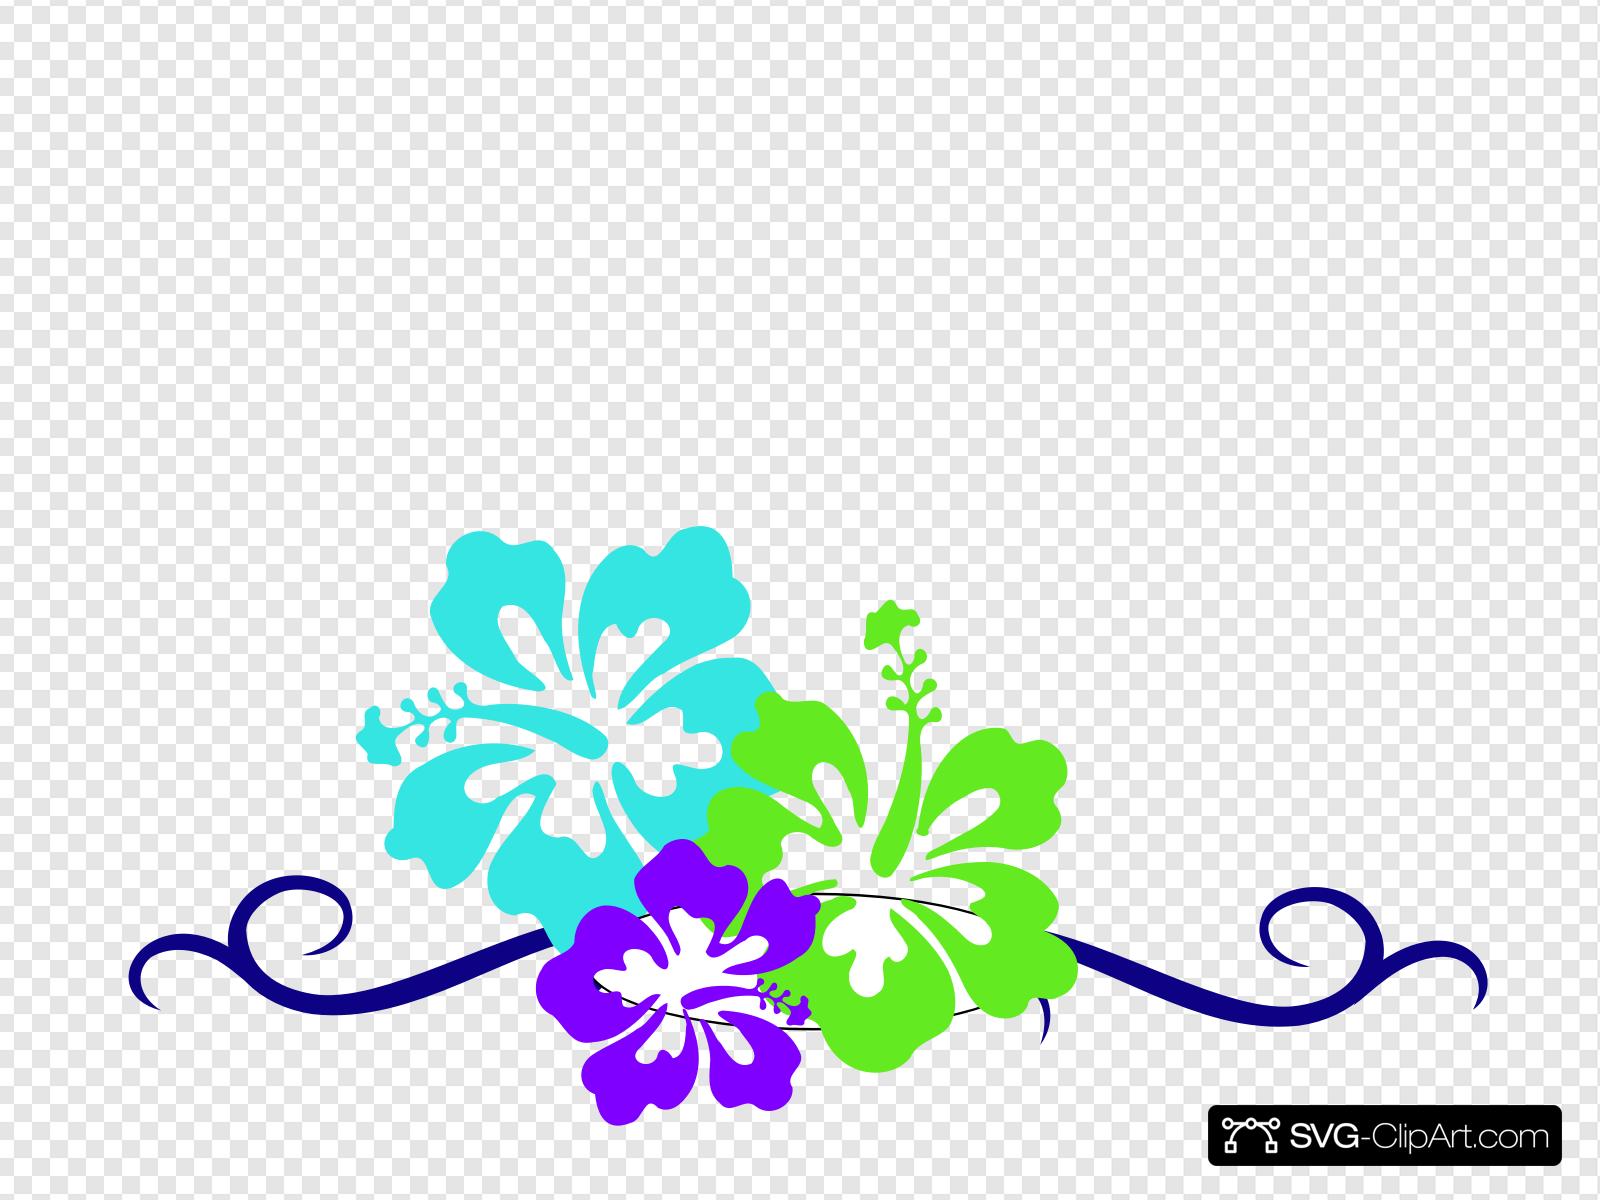 Hibiscus Swirl Border Clip art, Icon and SVG.